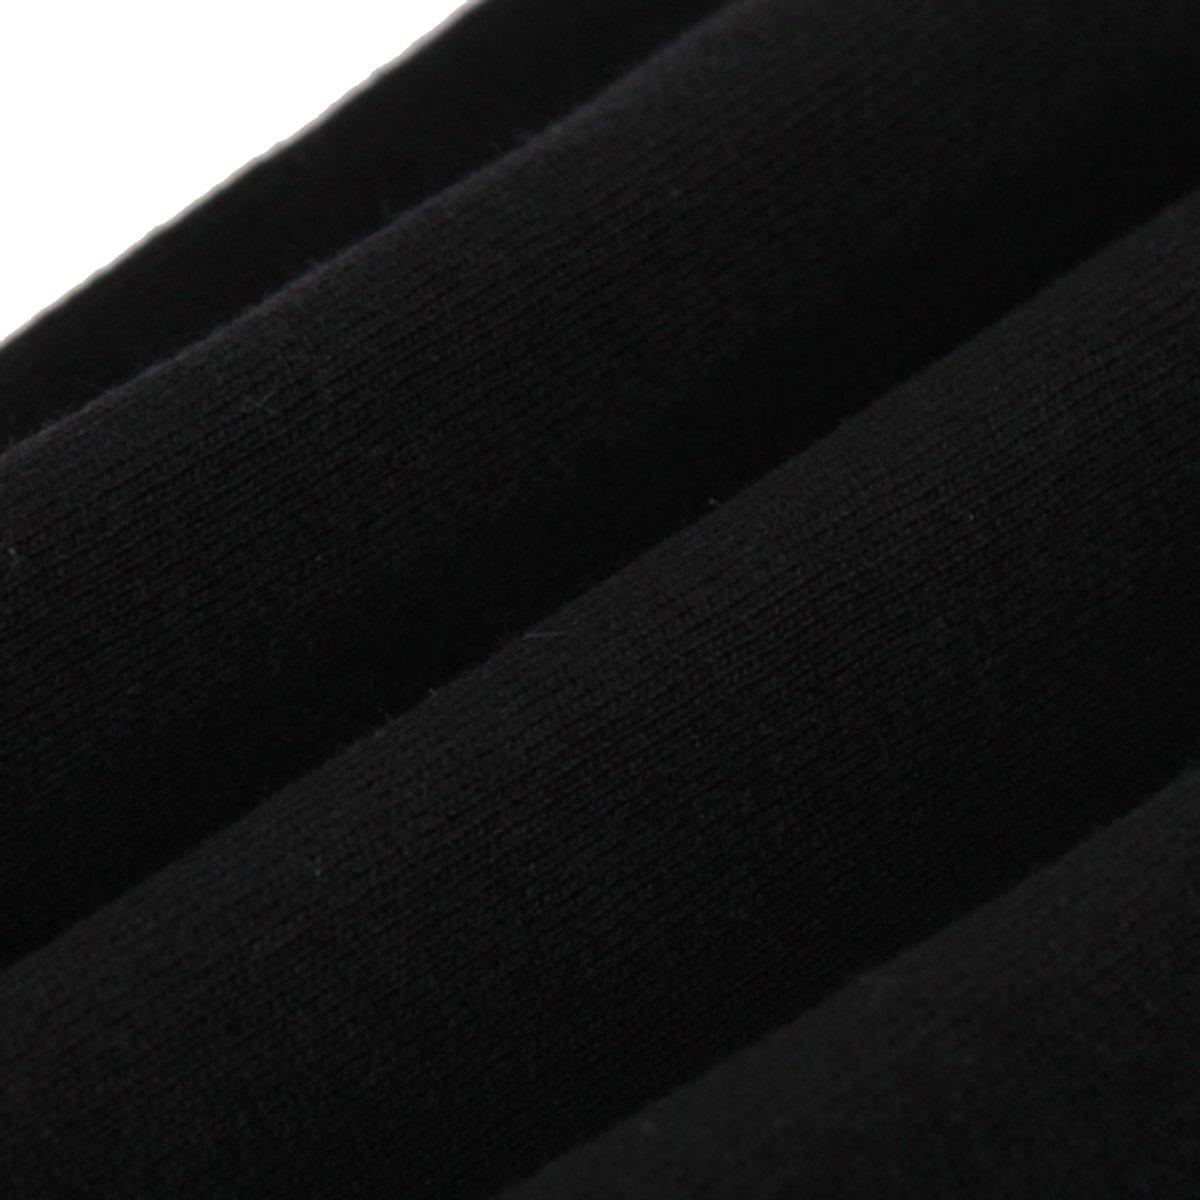 LI-NING FW Men Sports Letter Print Typical T-Shirt Breathable Summer Athetic Jerseys Black AHSN907 AHSN905 AHSN897 AHSN617